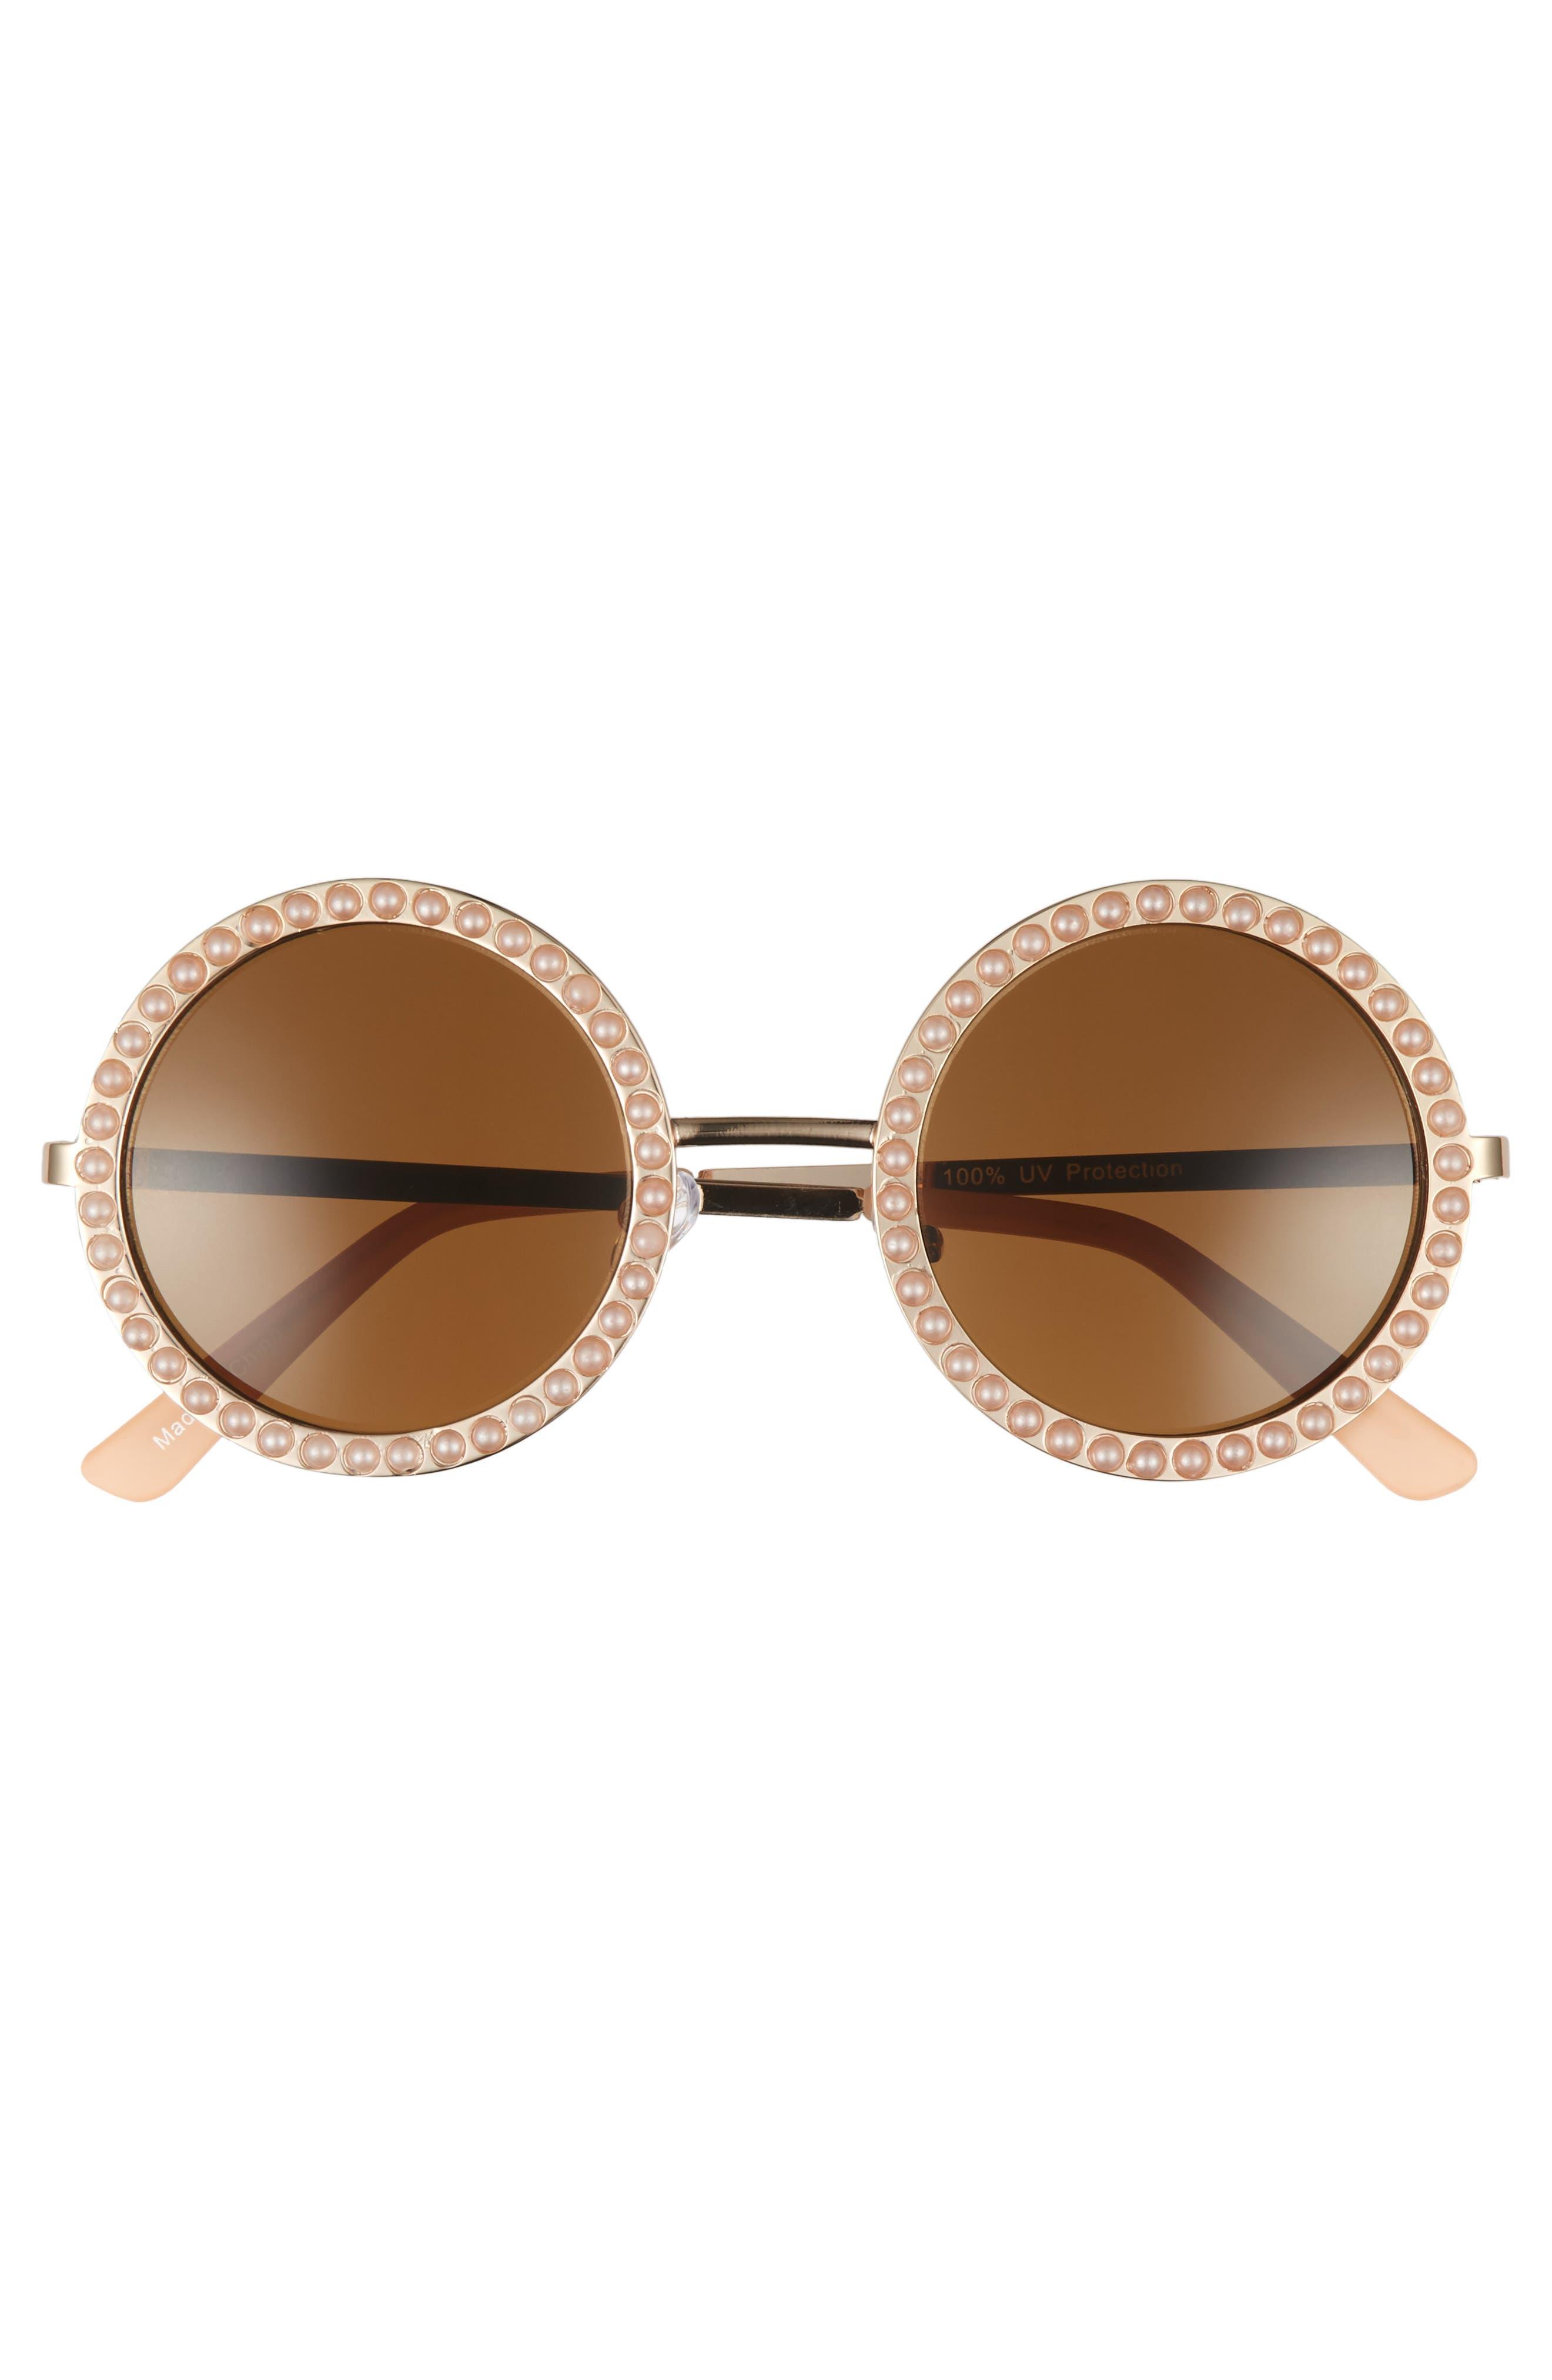 55mm Imitation Pearl Round Sunglasses,                             Alternate thumbnail 3, color,                             710